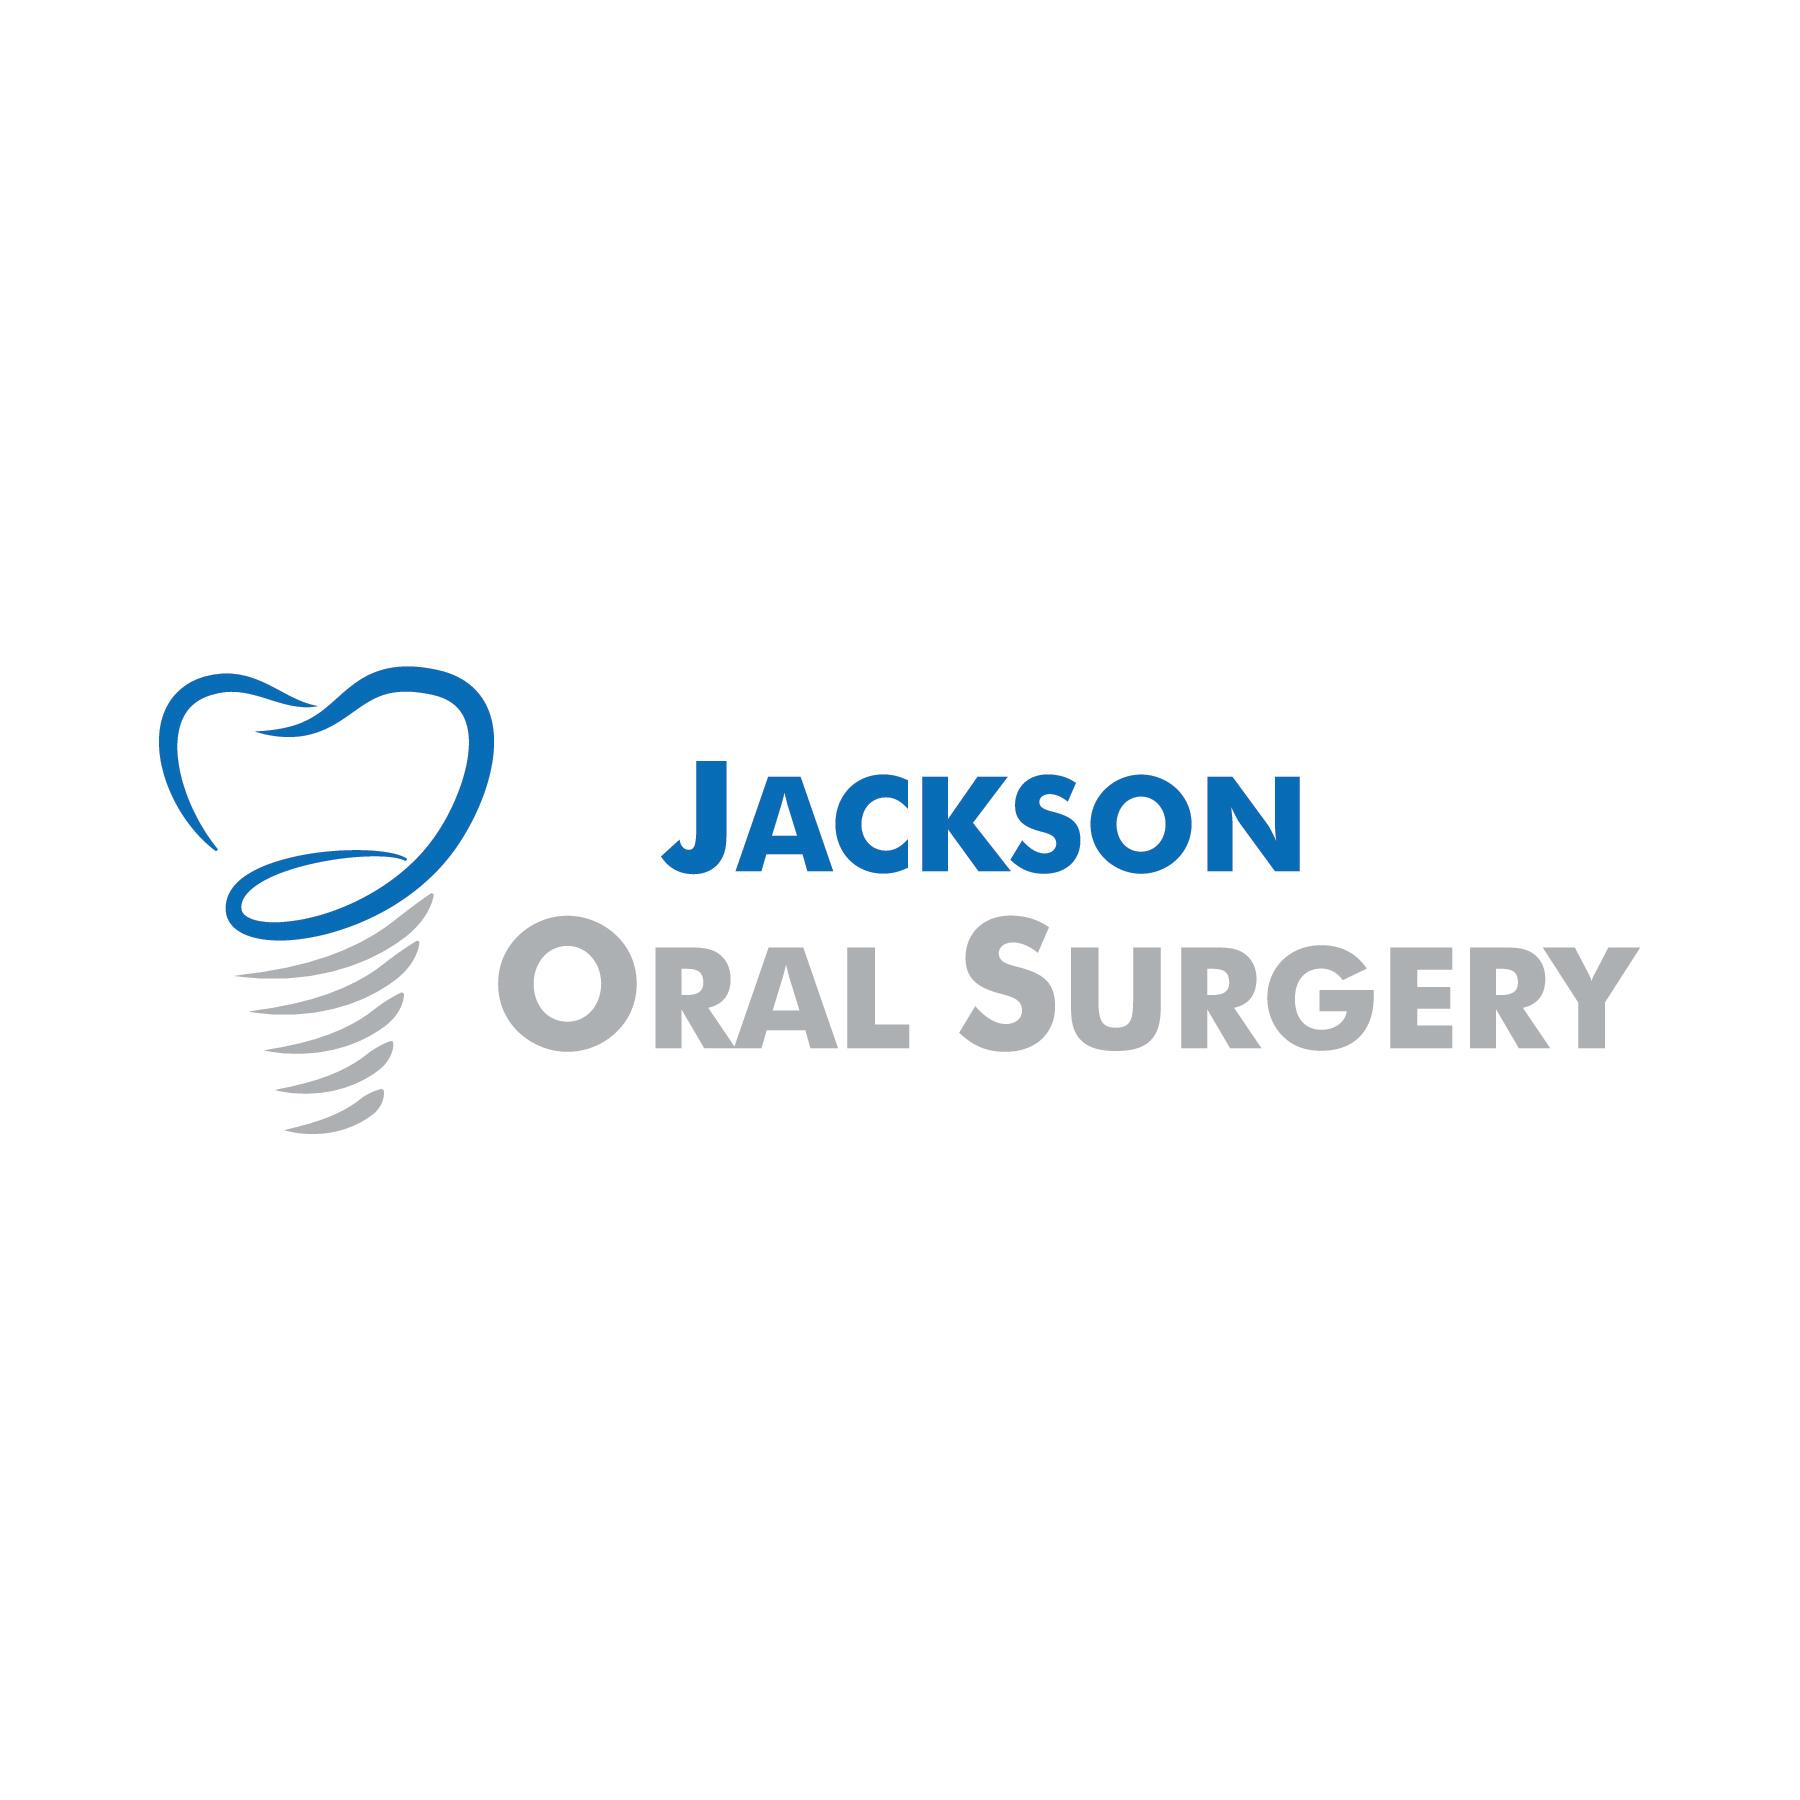 Jackson Oral Surgery: Walter C. Jackson, DDS, MD